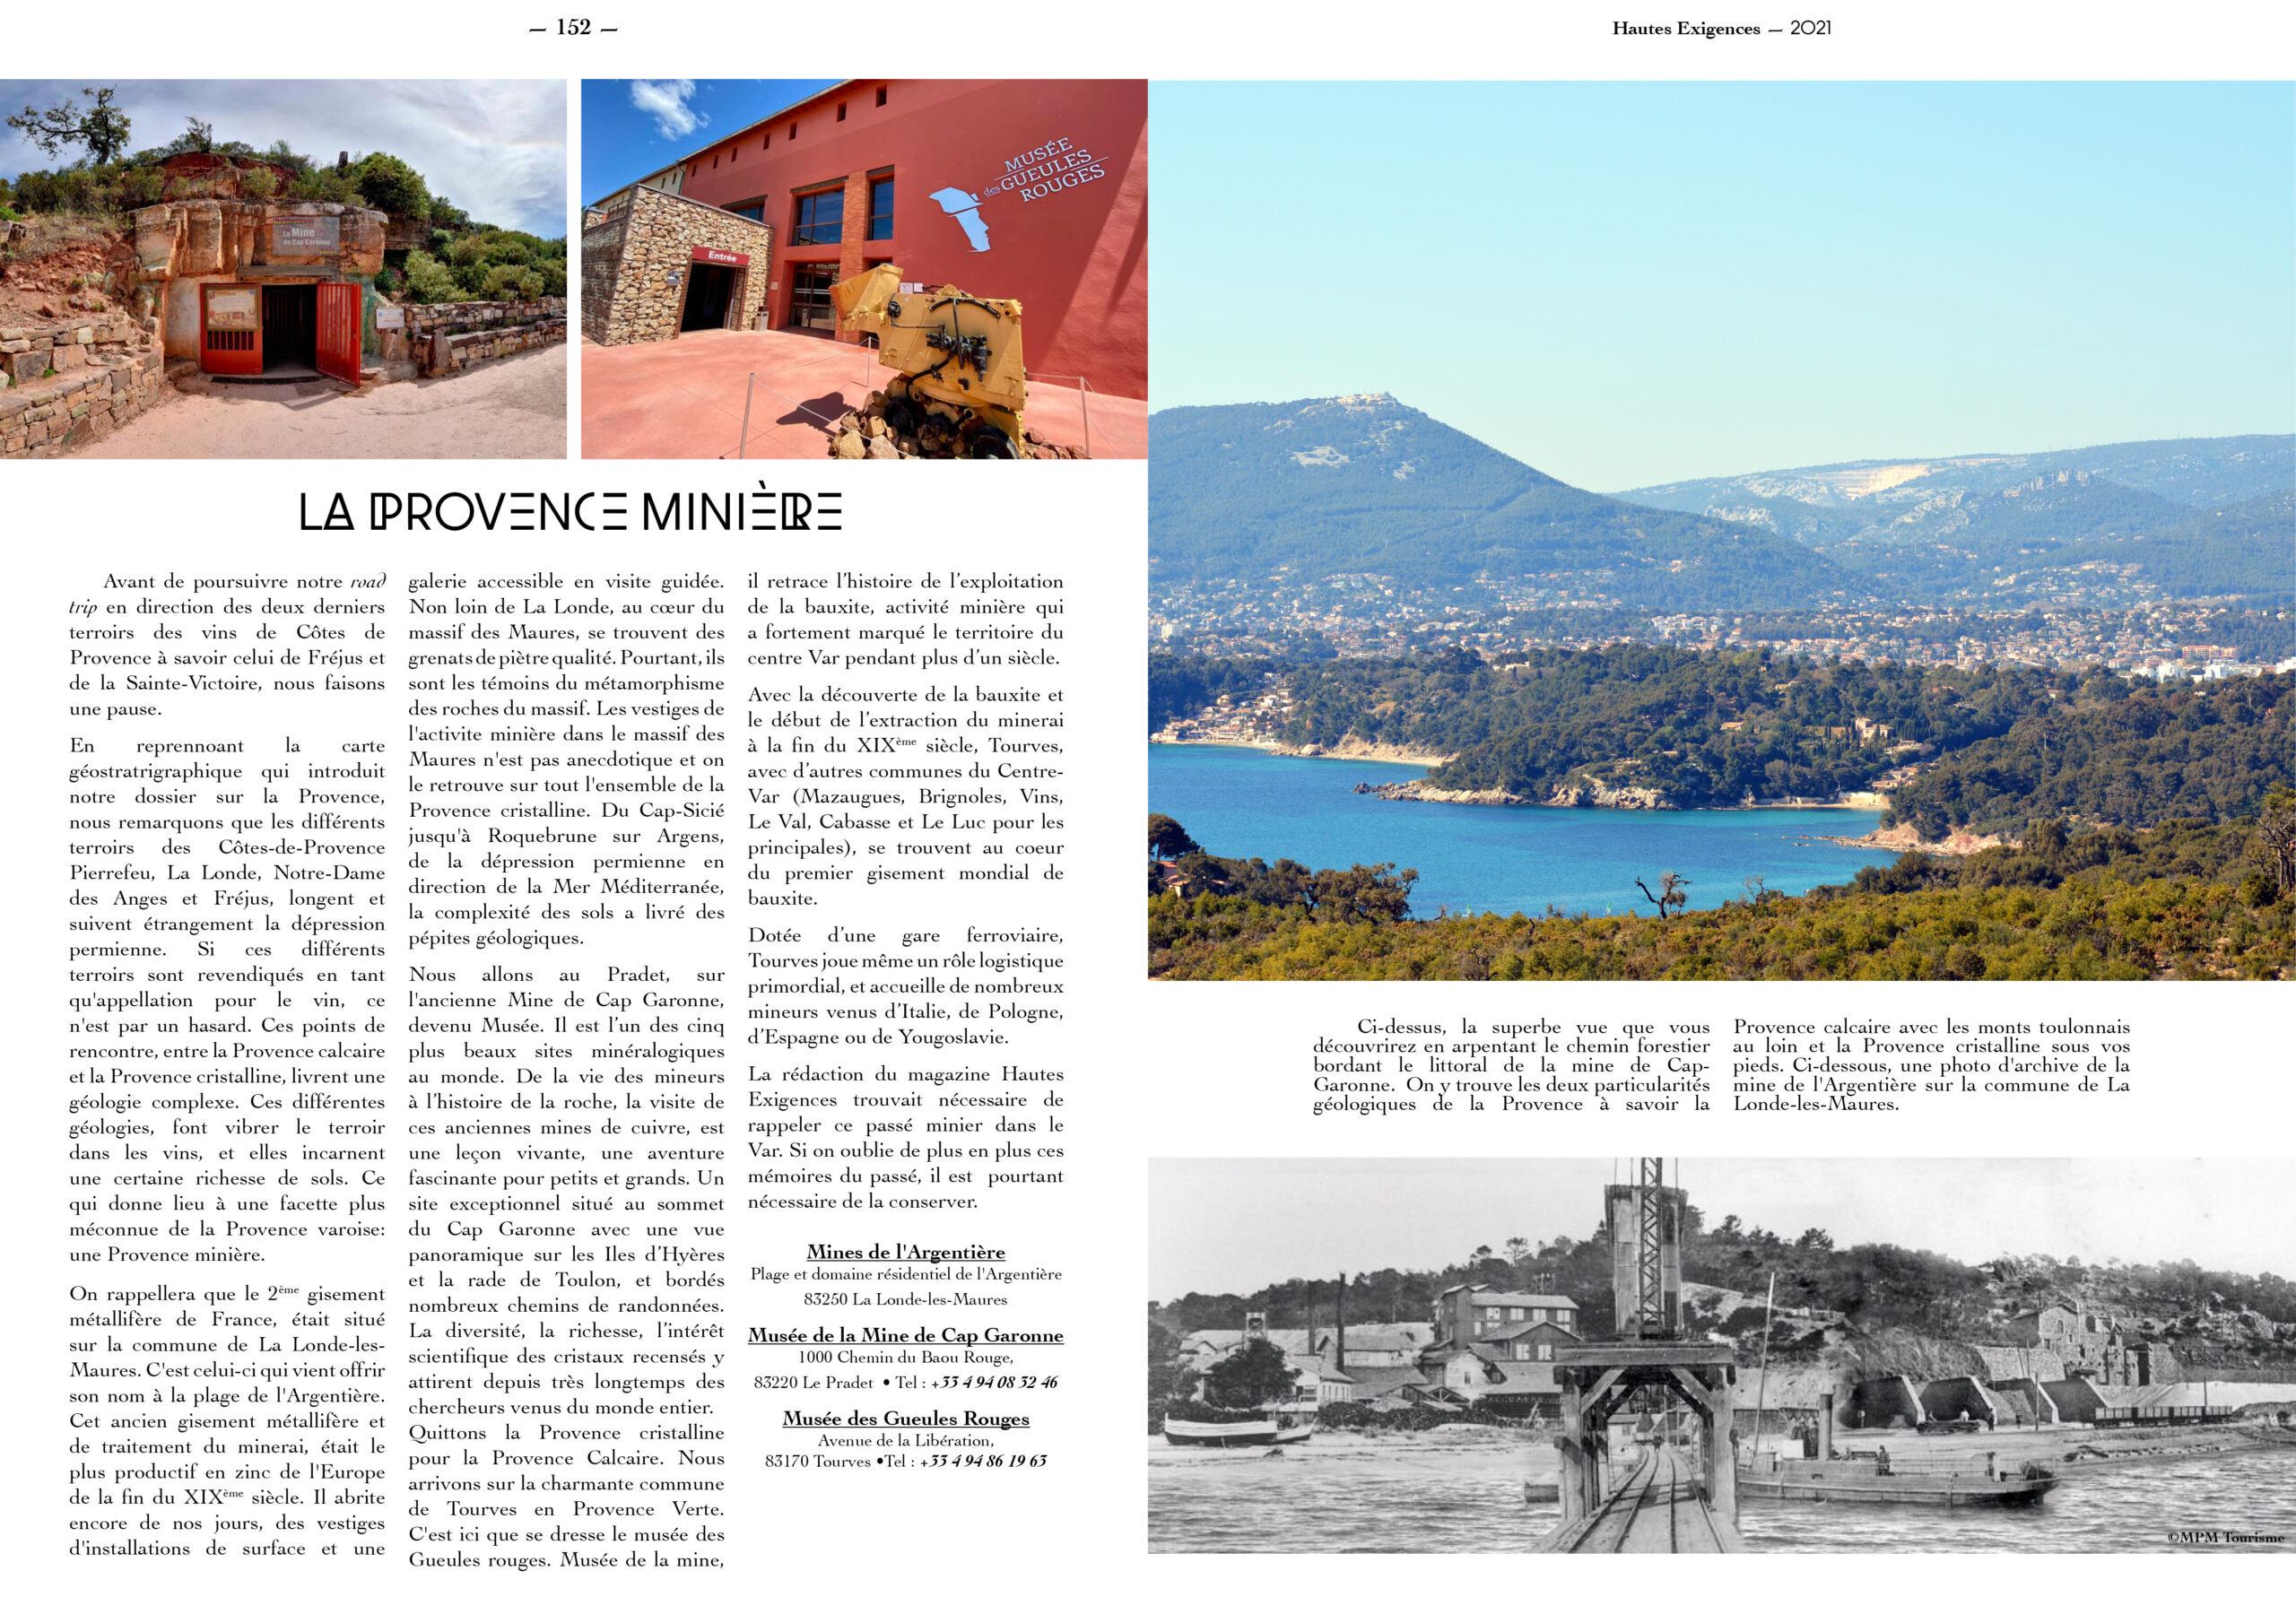 Hautes Exigences Magazine Hors Serie 2021 page 150-151